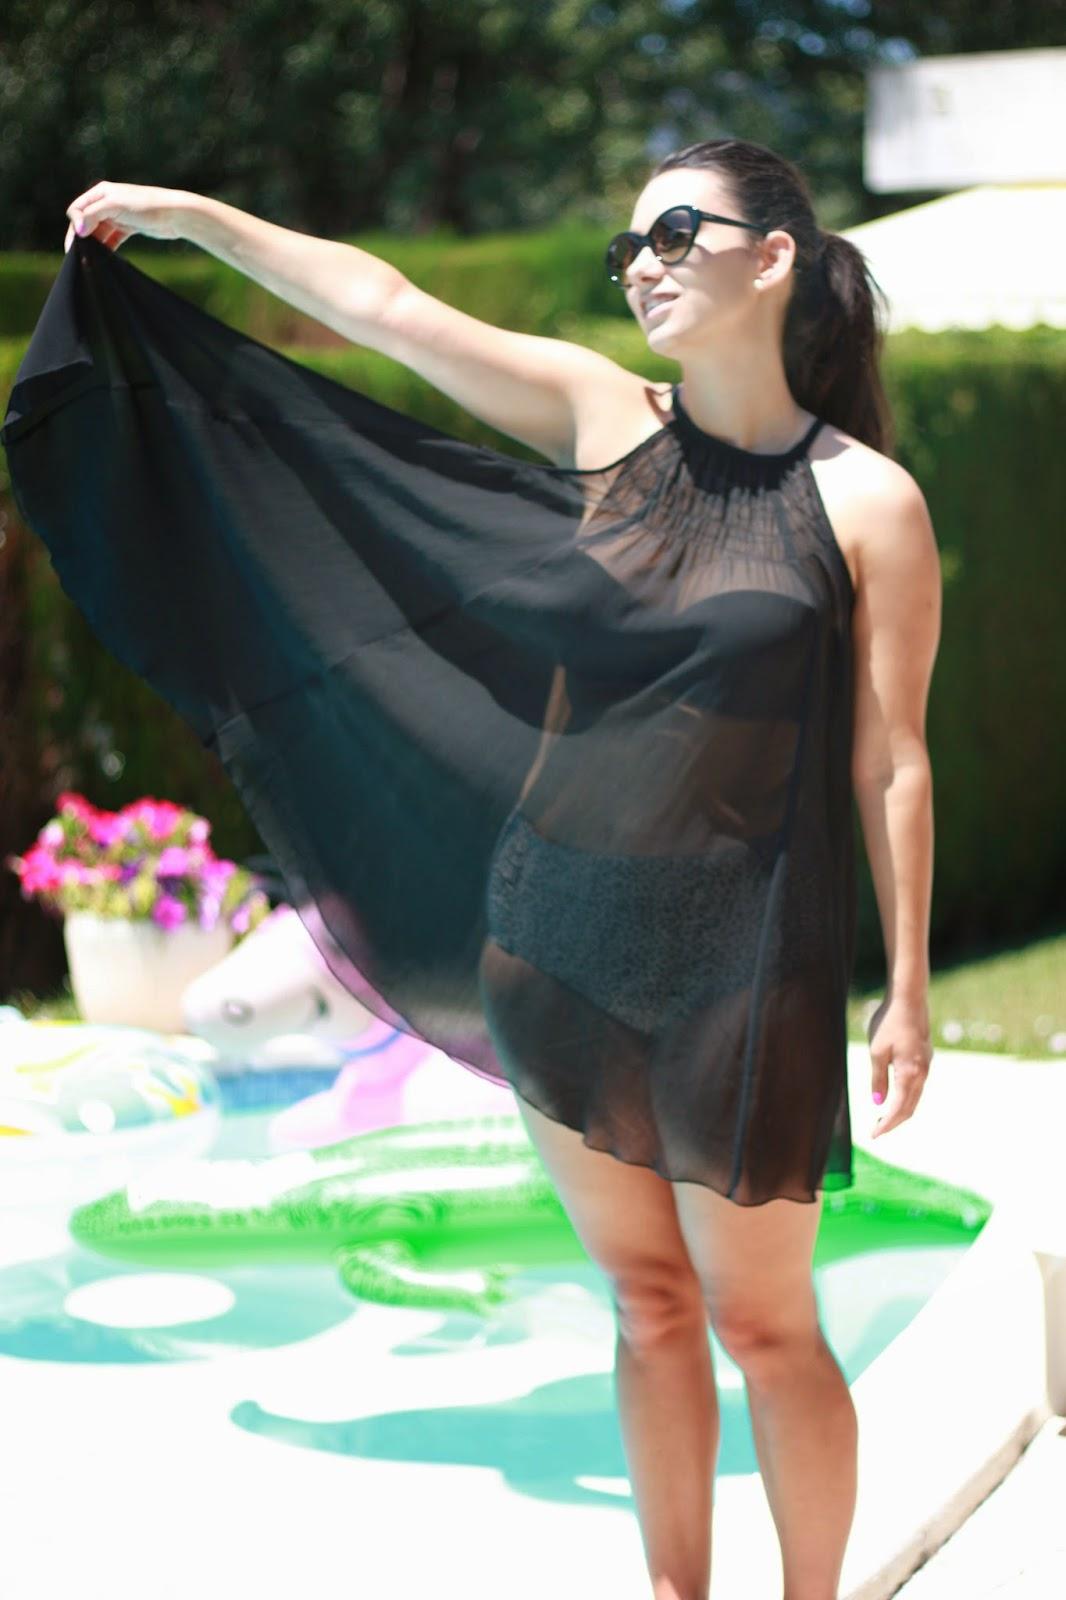 http://silviparalasamigas.blogspot.com.es/2013/07/operacion-bikini.html